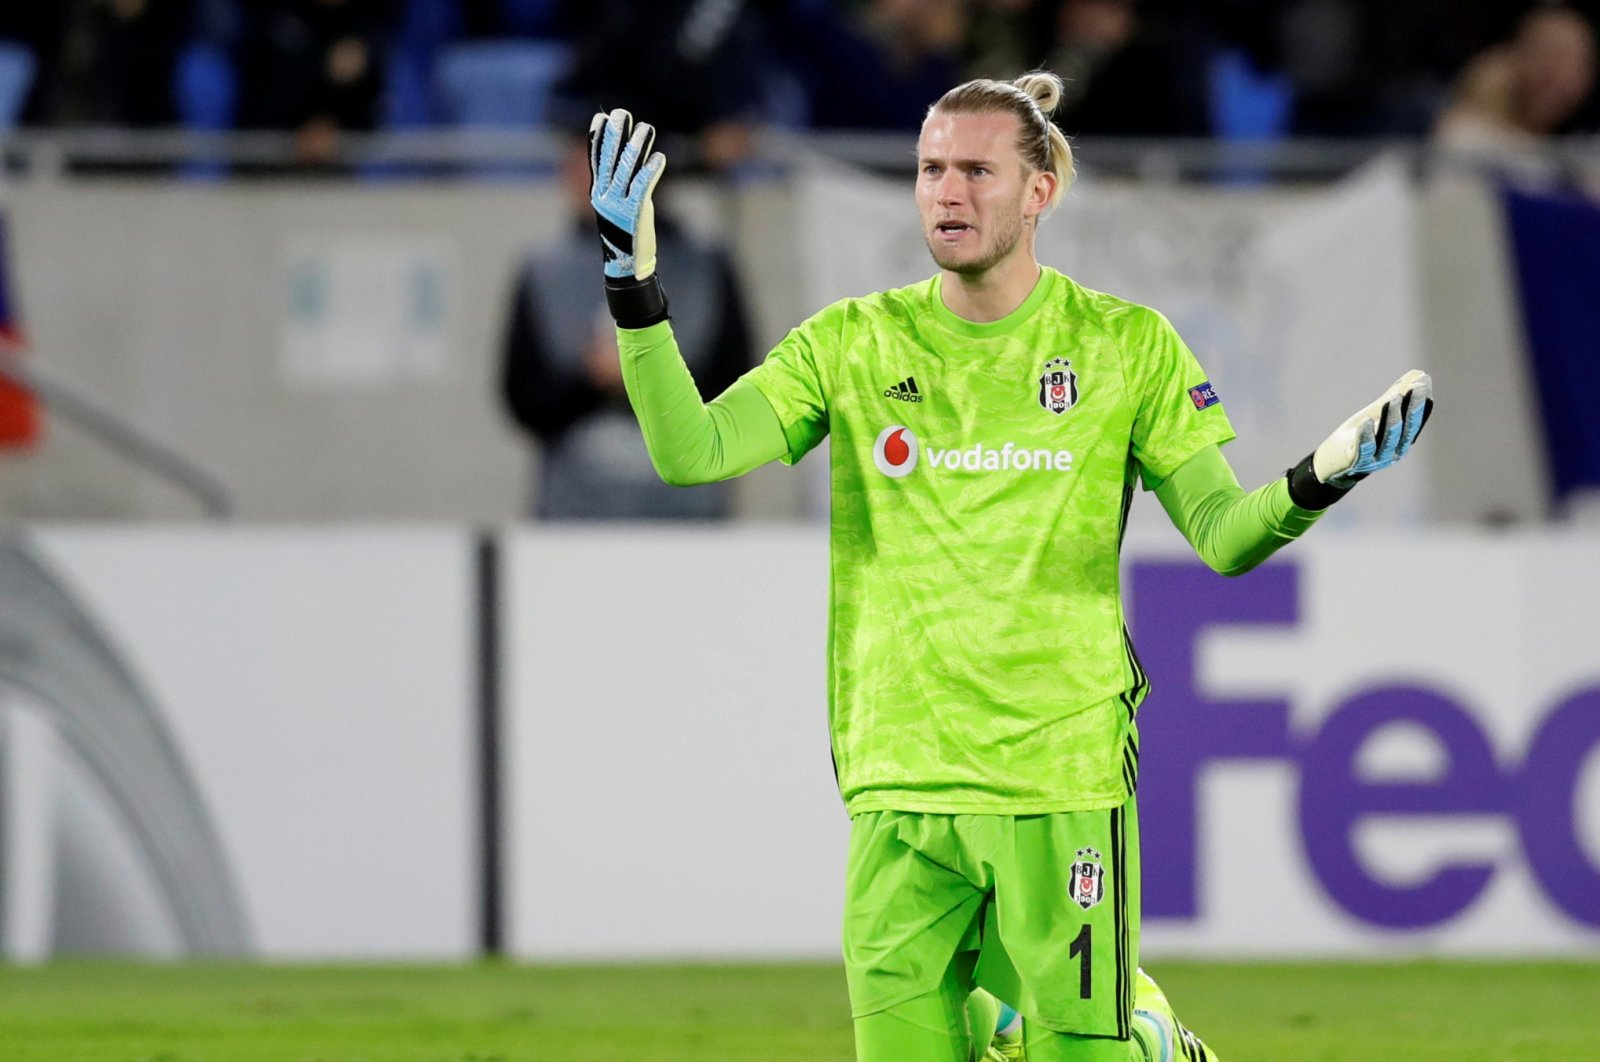 Beşiktaş golakeeper Loris Karius reacts after conceding a goal during a Europa League group stage match between Slovan Bratislava and Beşiktaş in Bratislava, Slovakia, Sept. 19, 2019. (Reuters Photo)